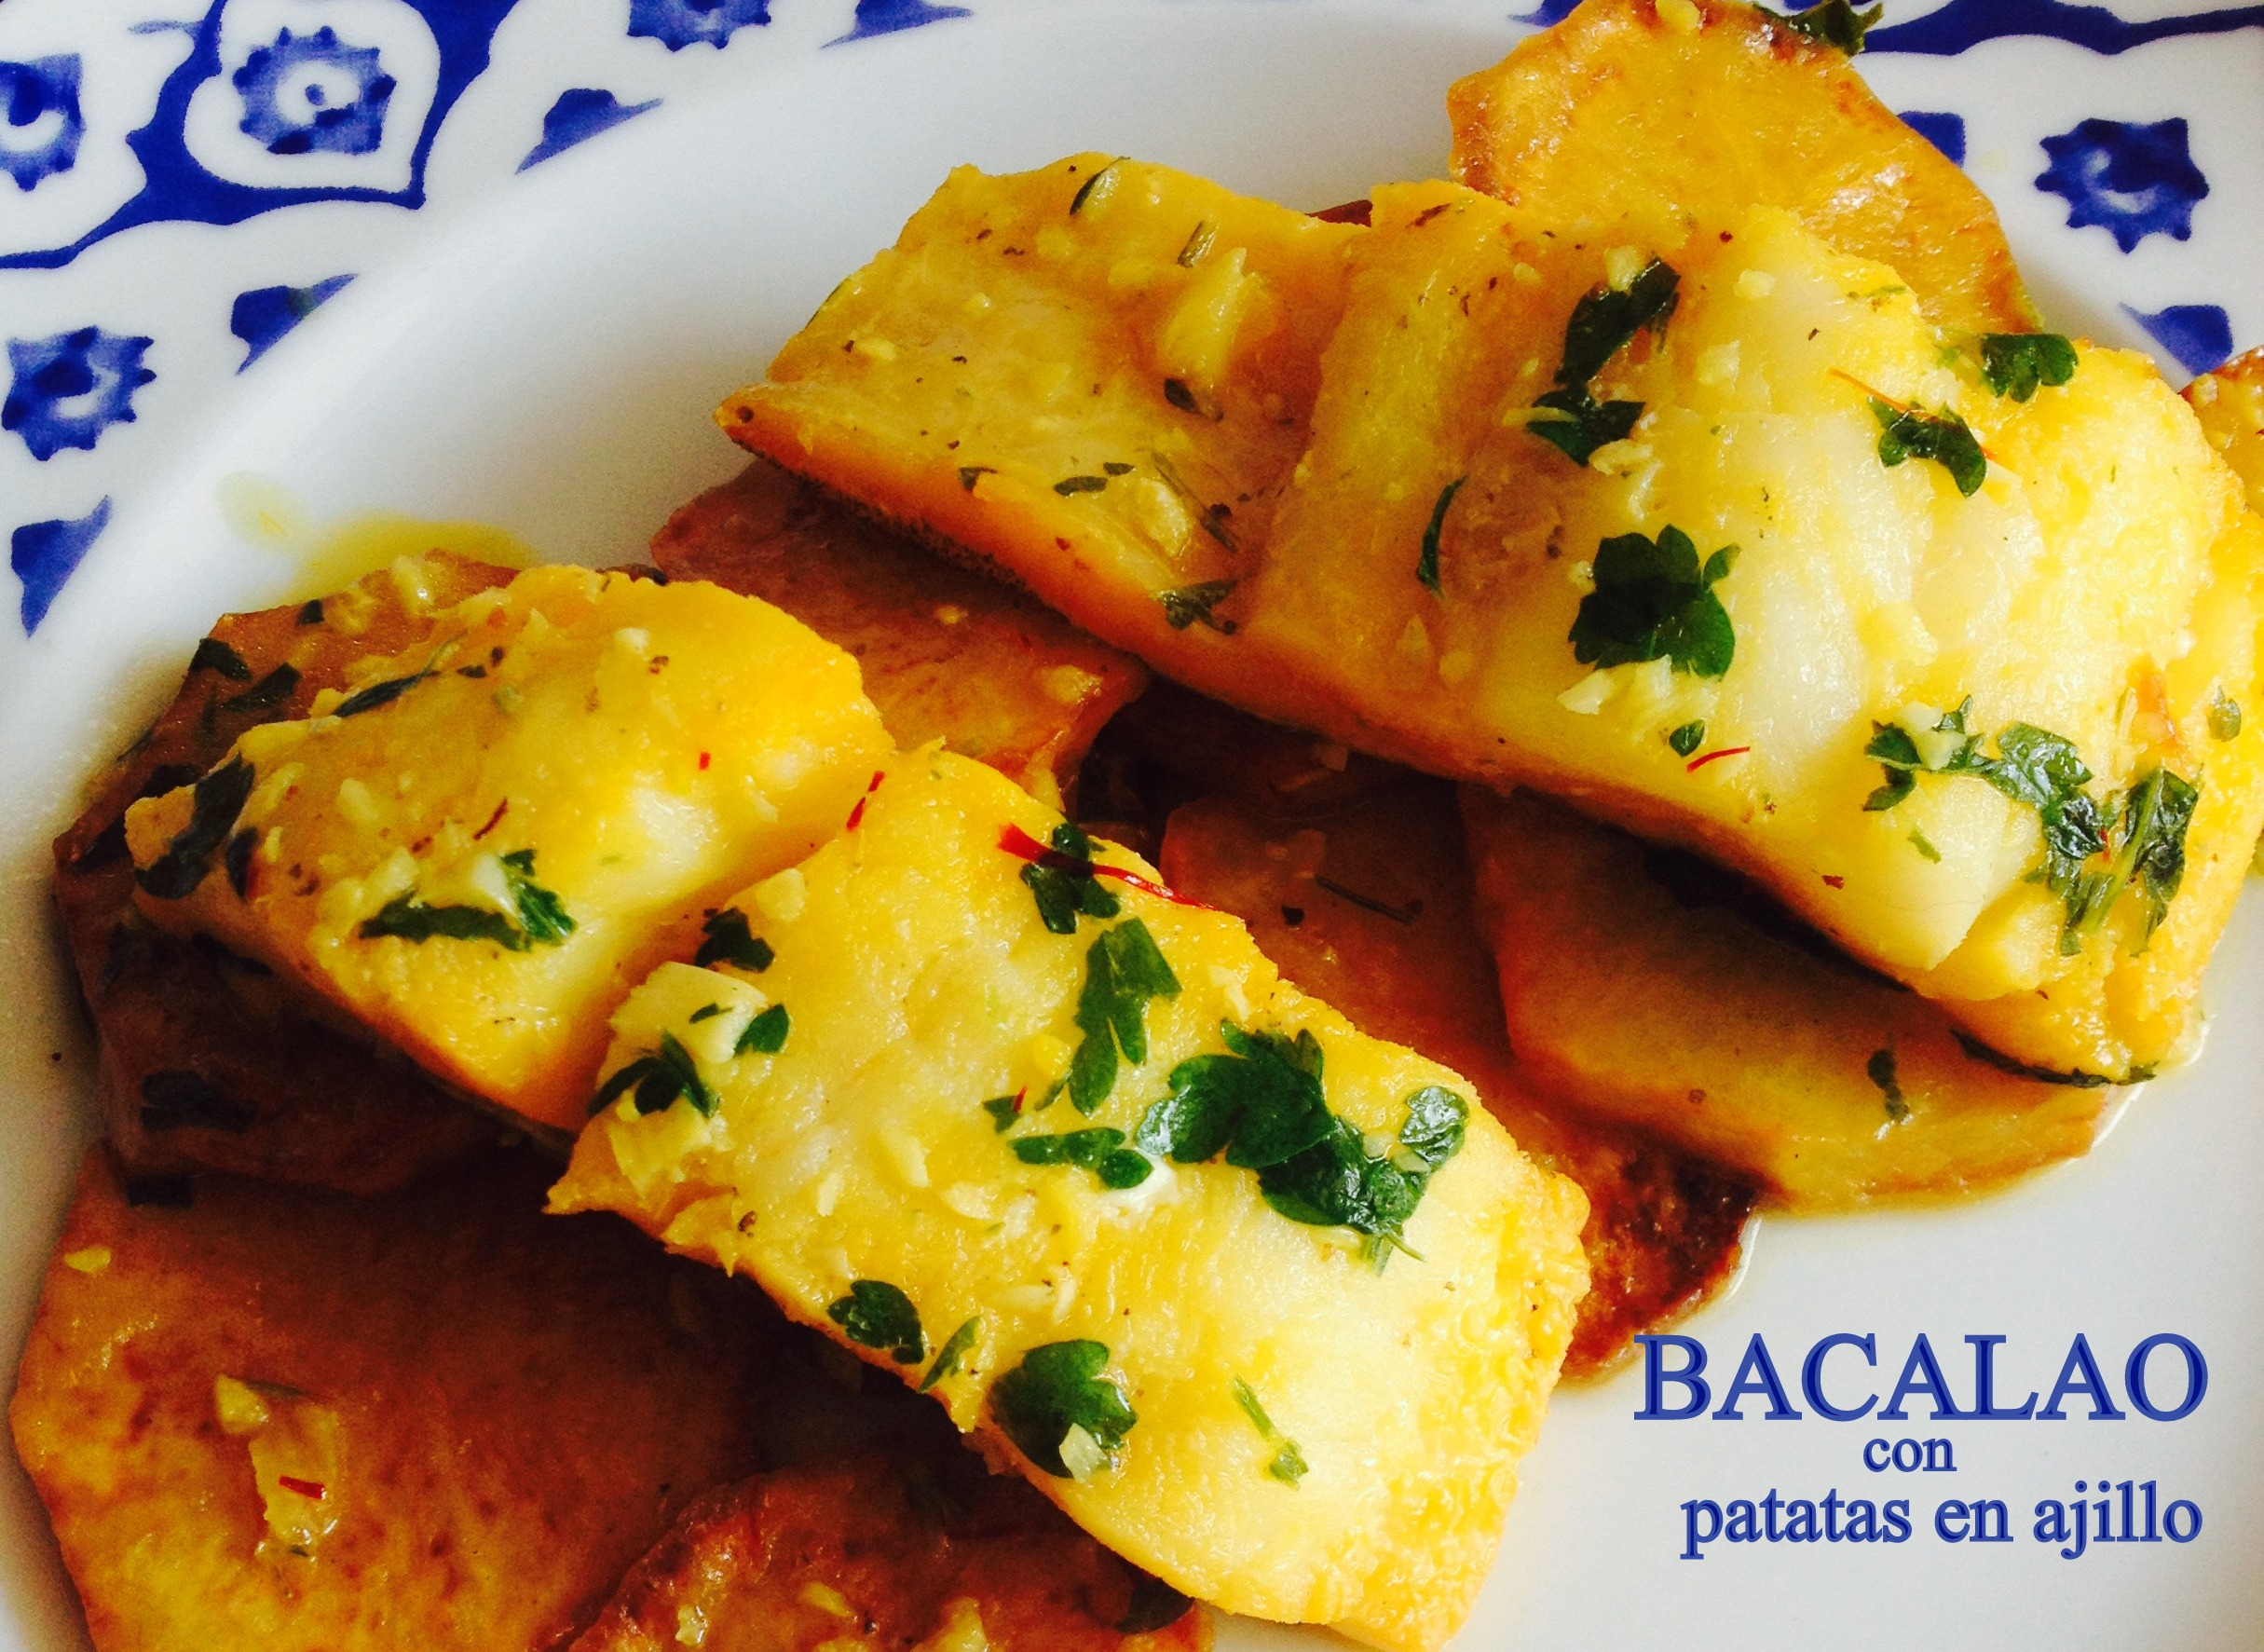 Bacalao con patatas ali adas niny receta canal cocina for Cocina bacalao con patatas